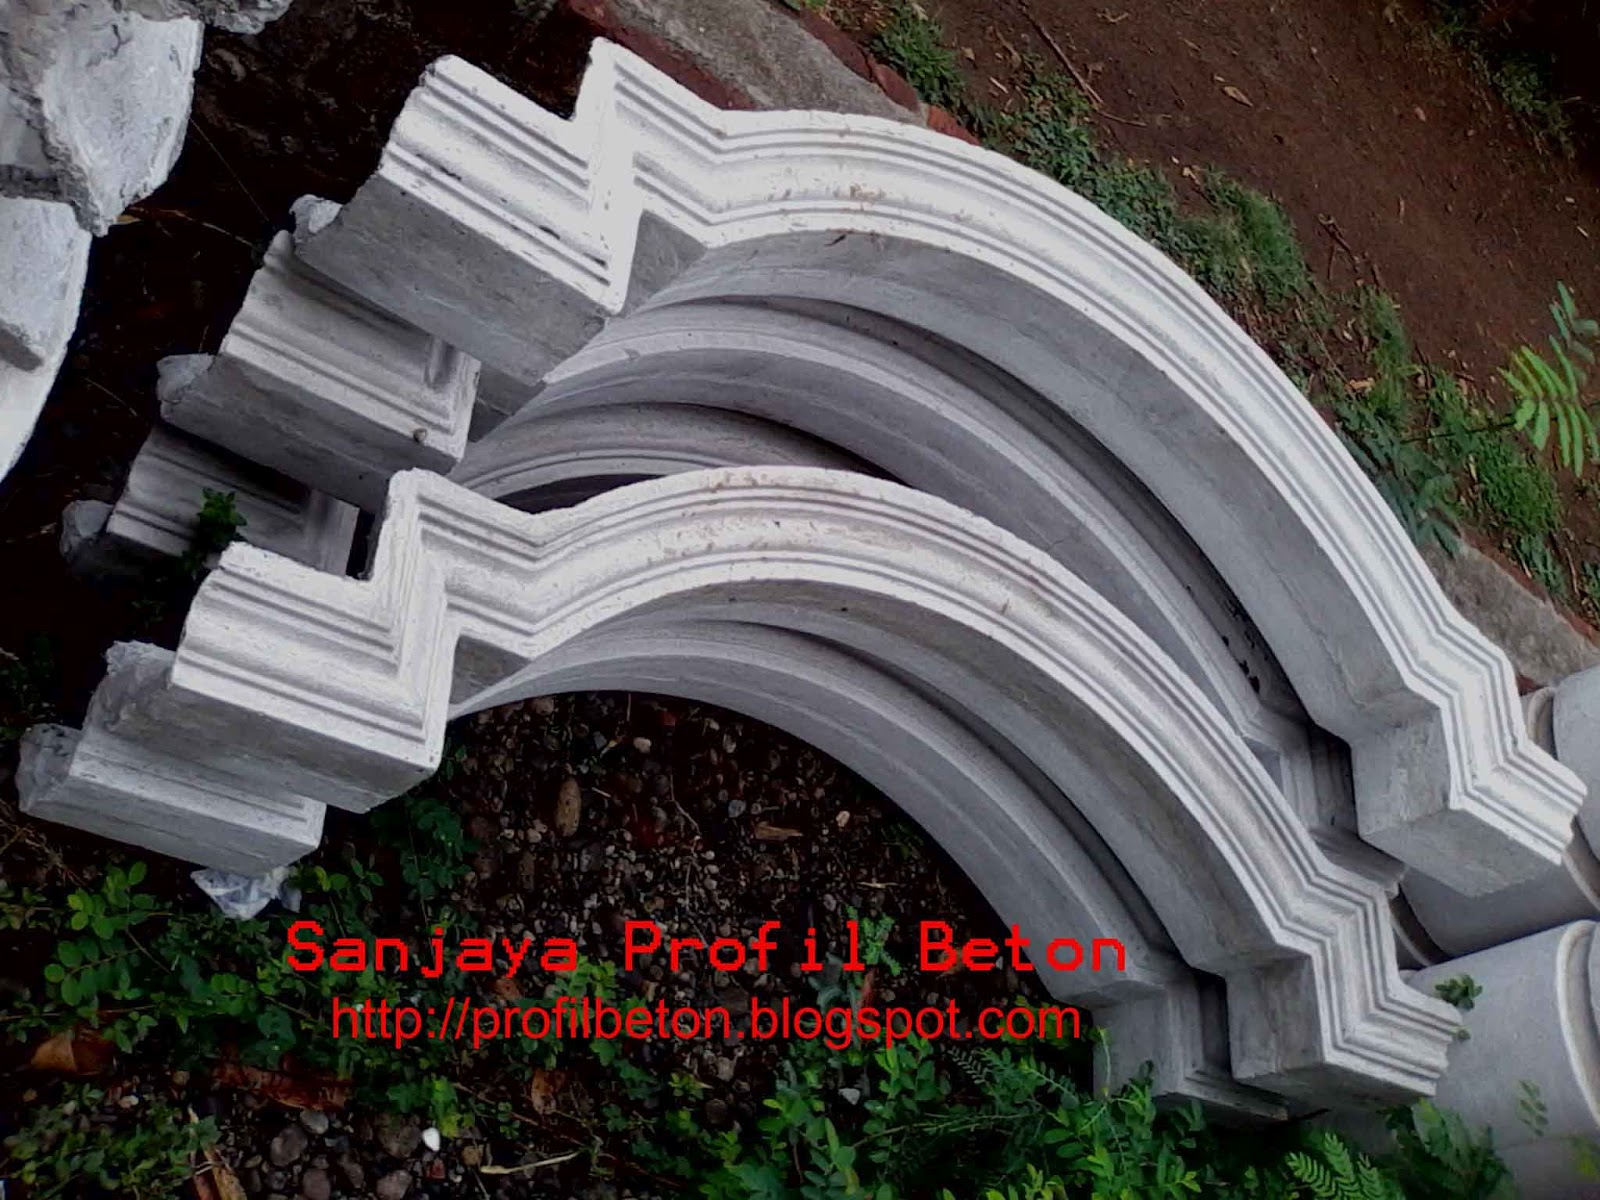 sanjaya profil beton profil plengkung. Black Bedroom Furniture Sets. Home Design Ideas